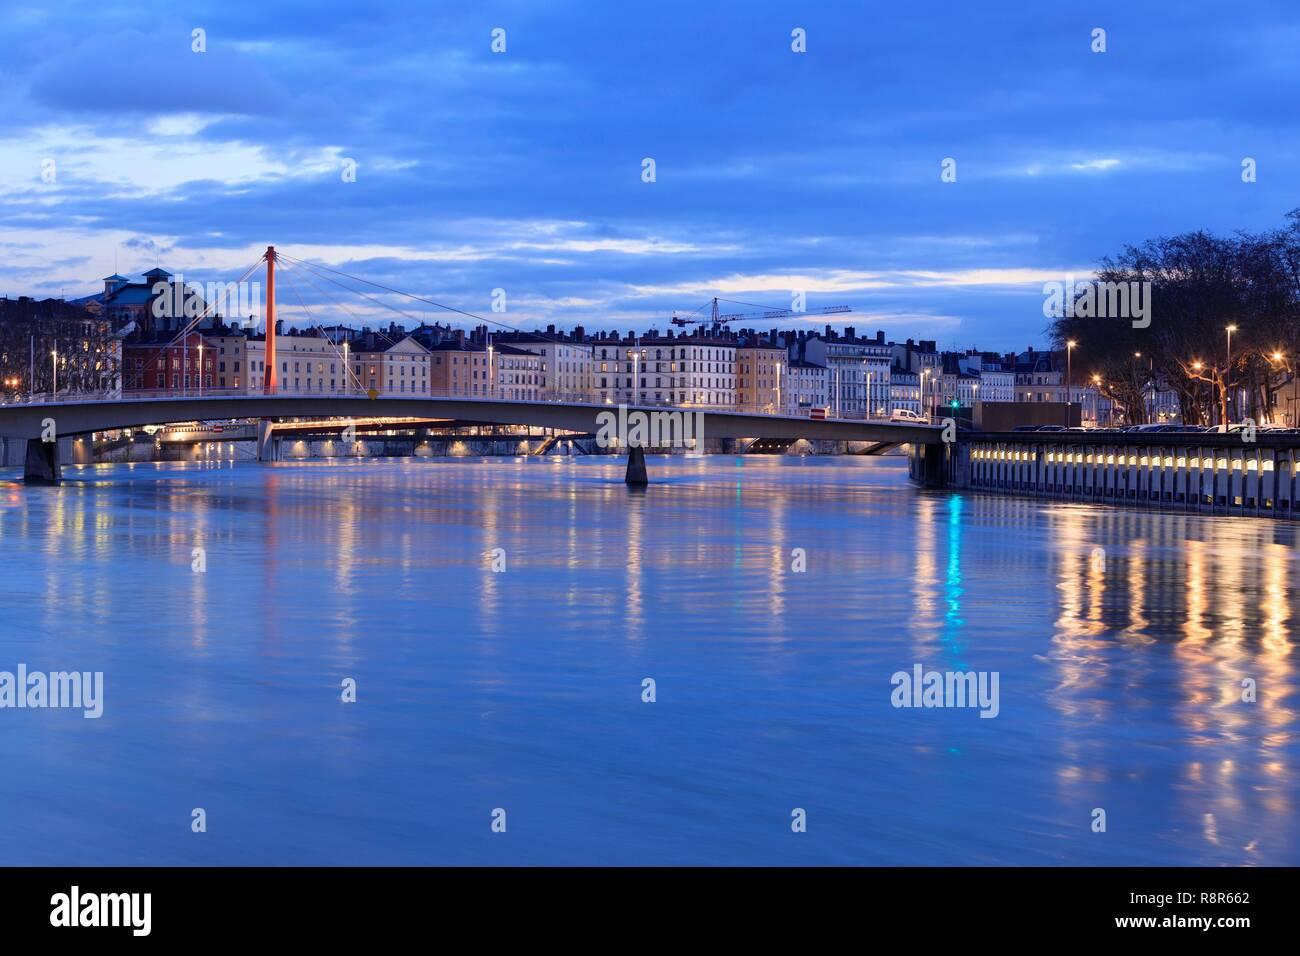 France, Rhône, Lyon, 5th arrondissement, Vieux Lyon district, Alphonse Juin bridge over the Saône in flood - Stock Image